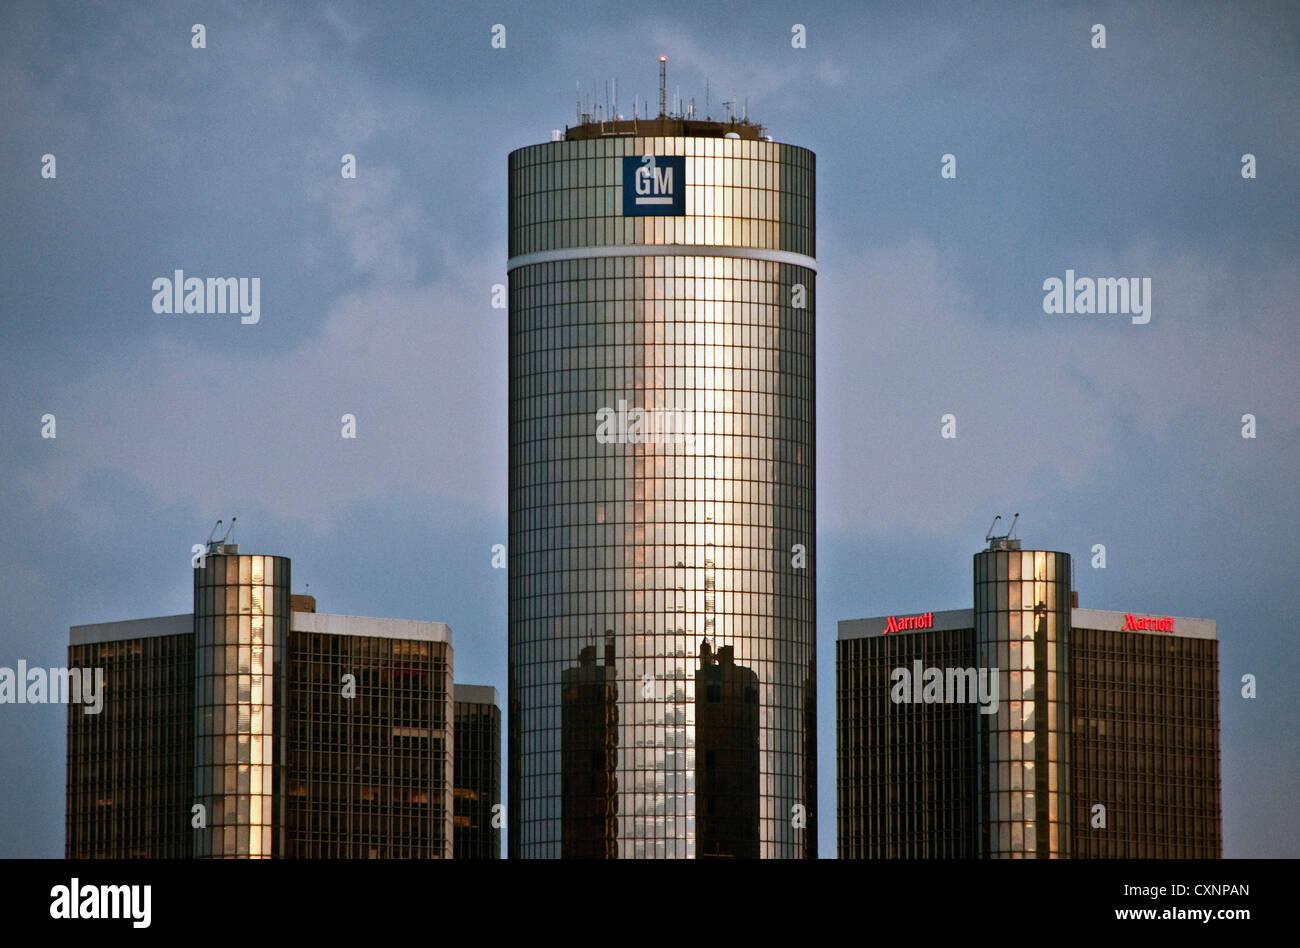 General Motors headquarters in Detroit's Renaissance Center - Stock Image